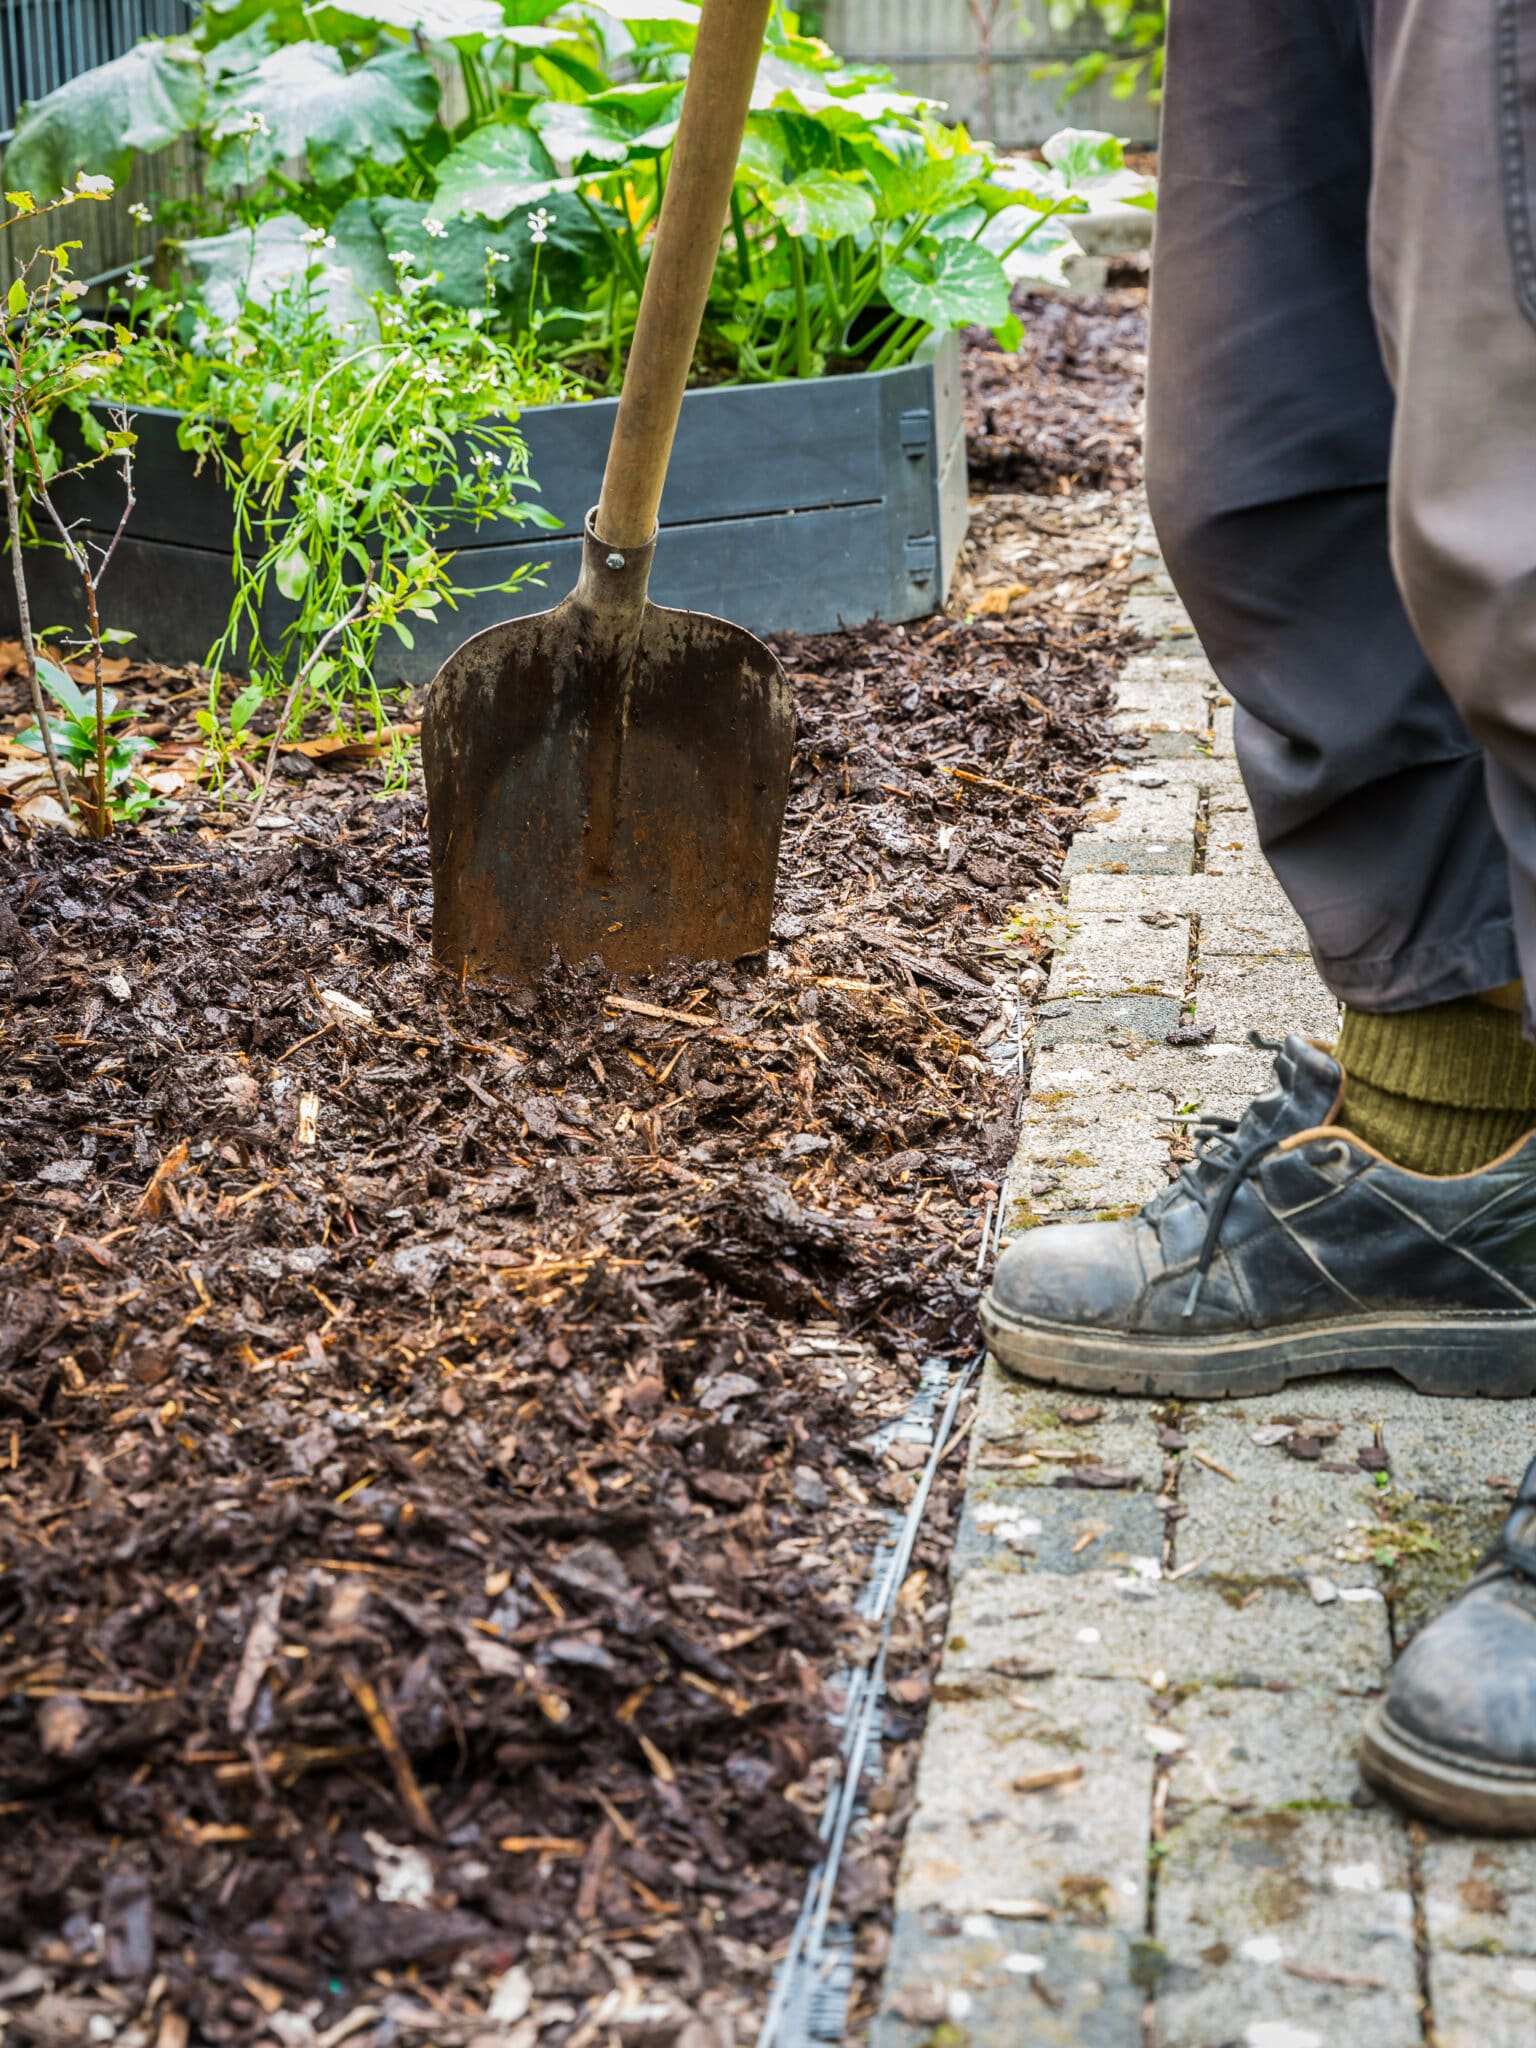 A gardener spreading mulch for spring gardening prep.